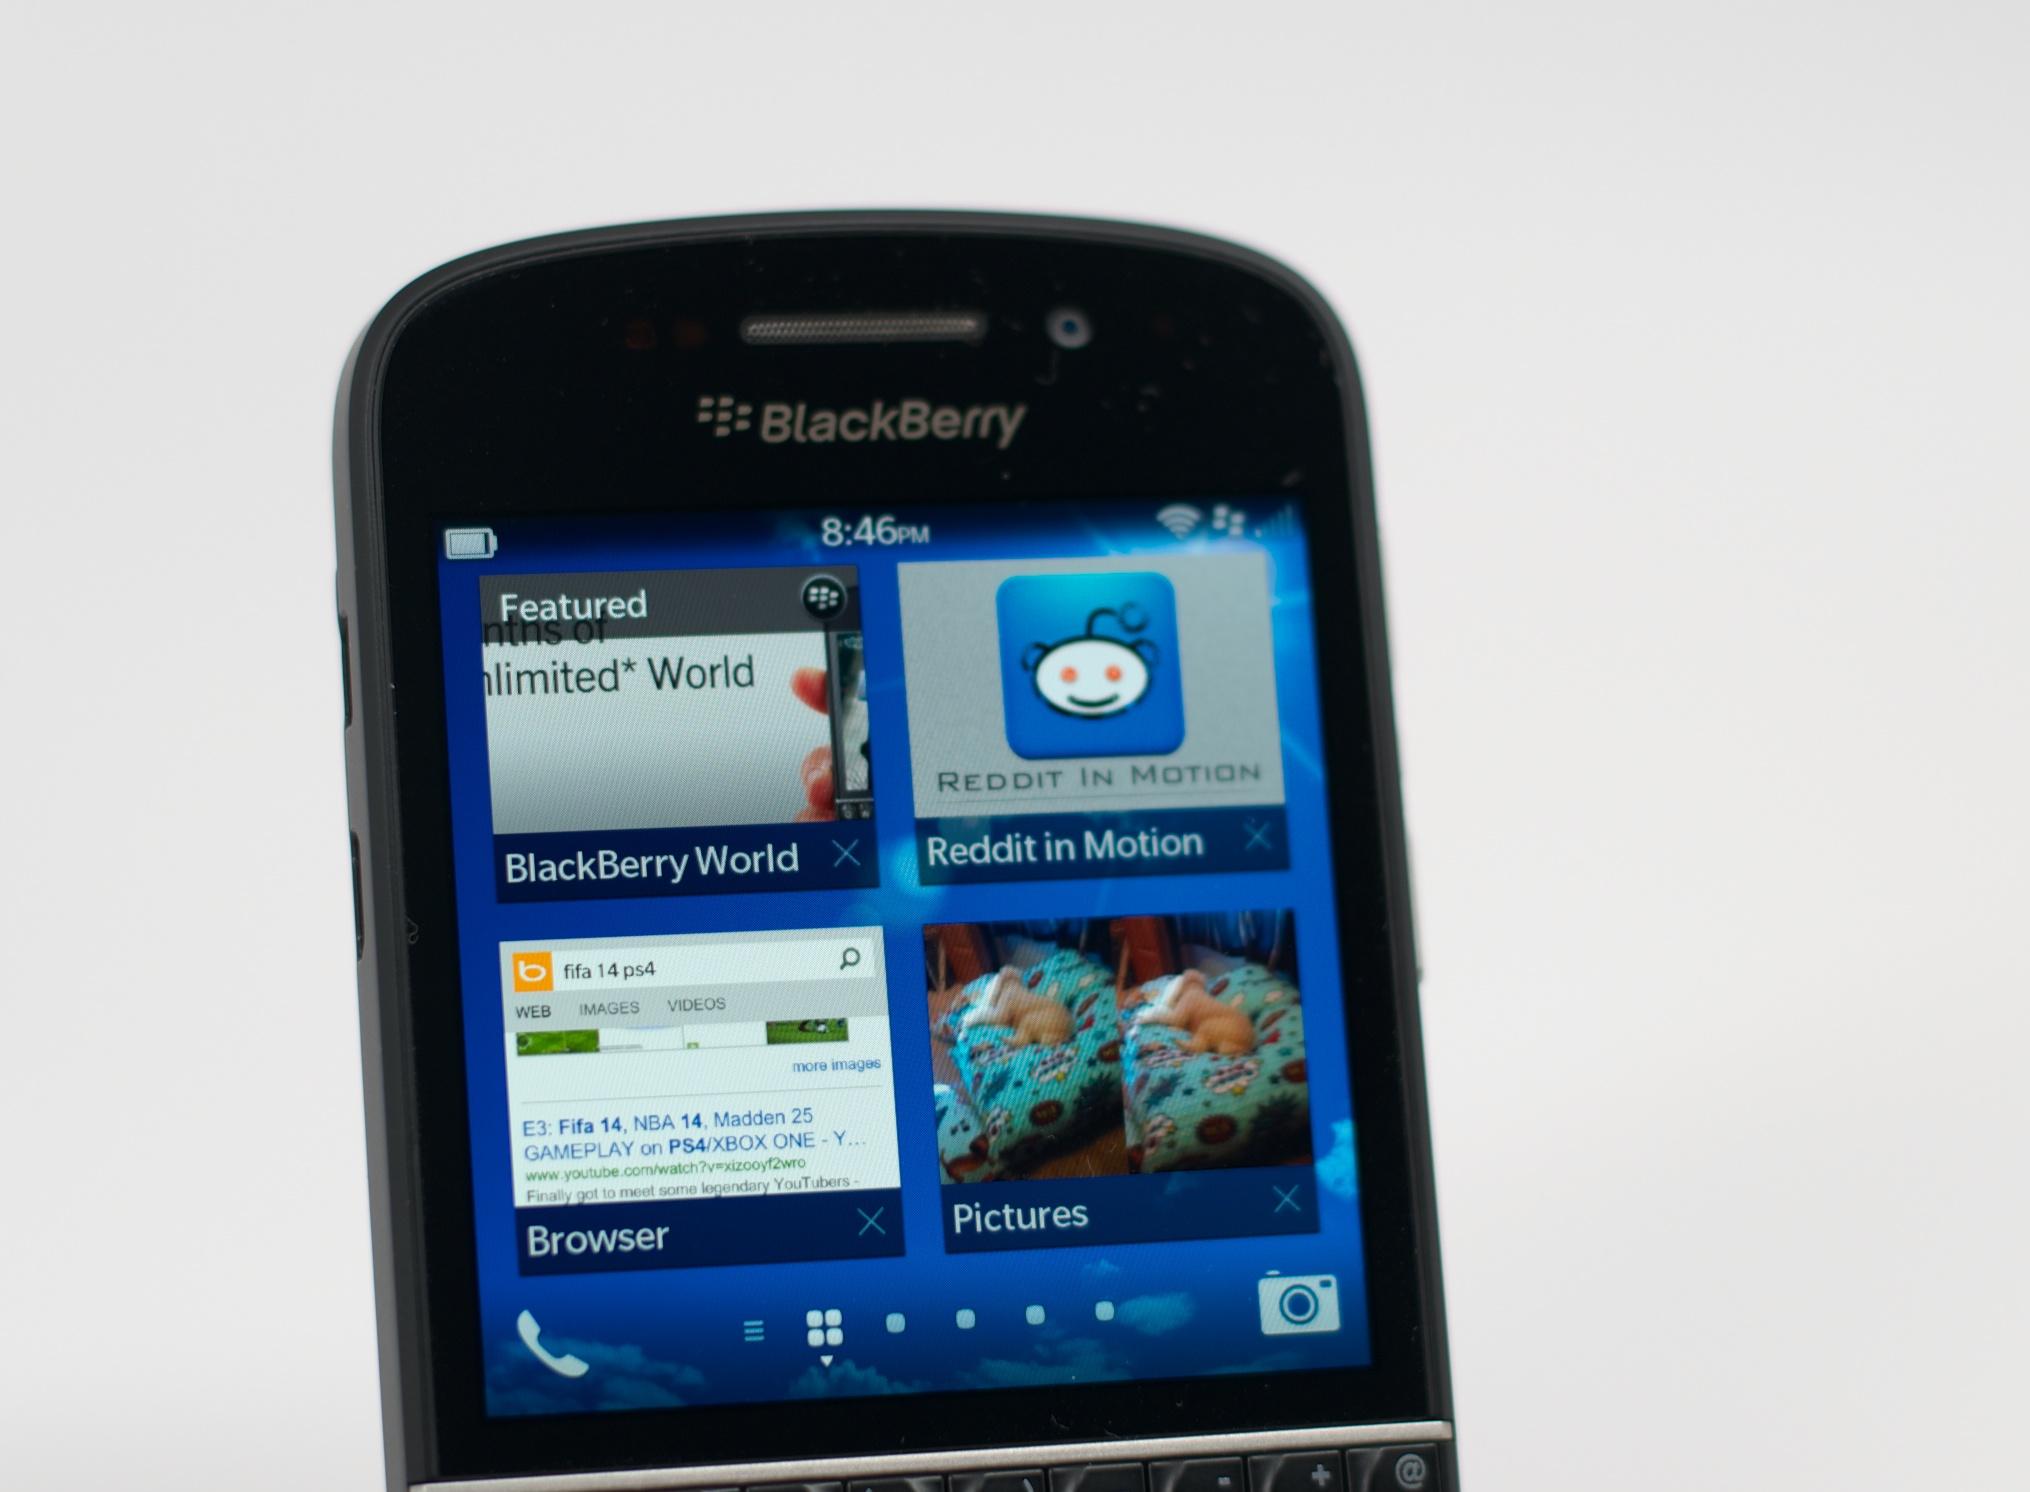 Verizon blackberry q10 review blackberry q10 gallery ccuart Choice Image